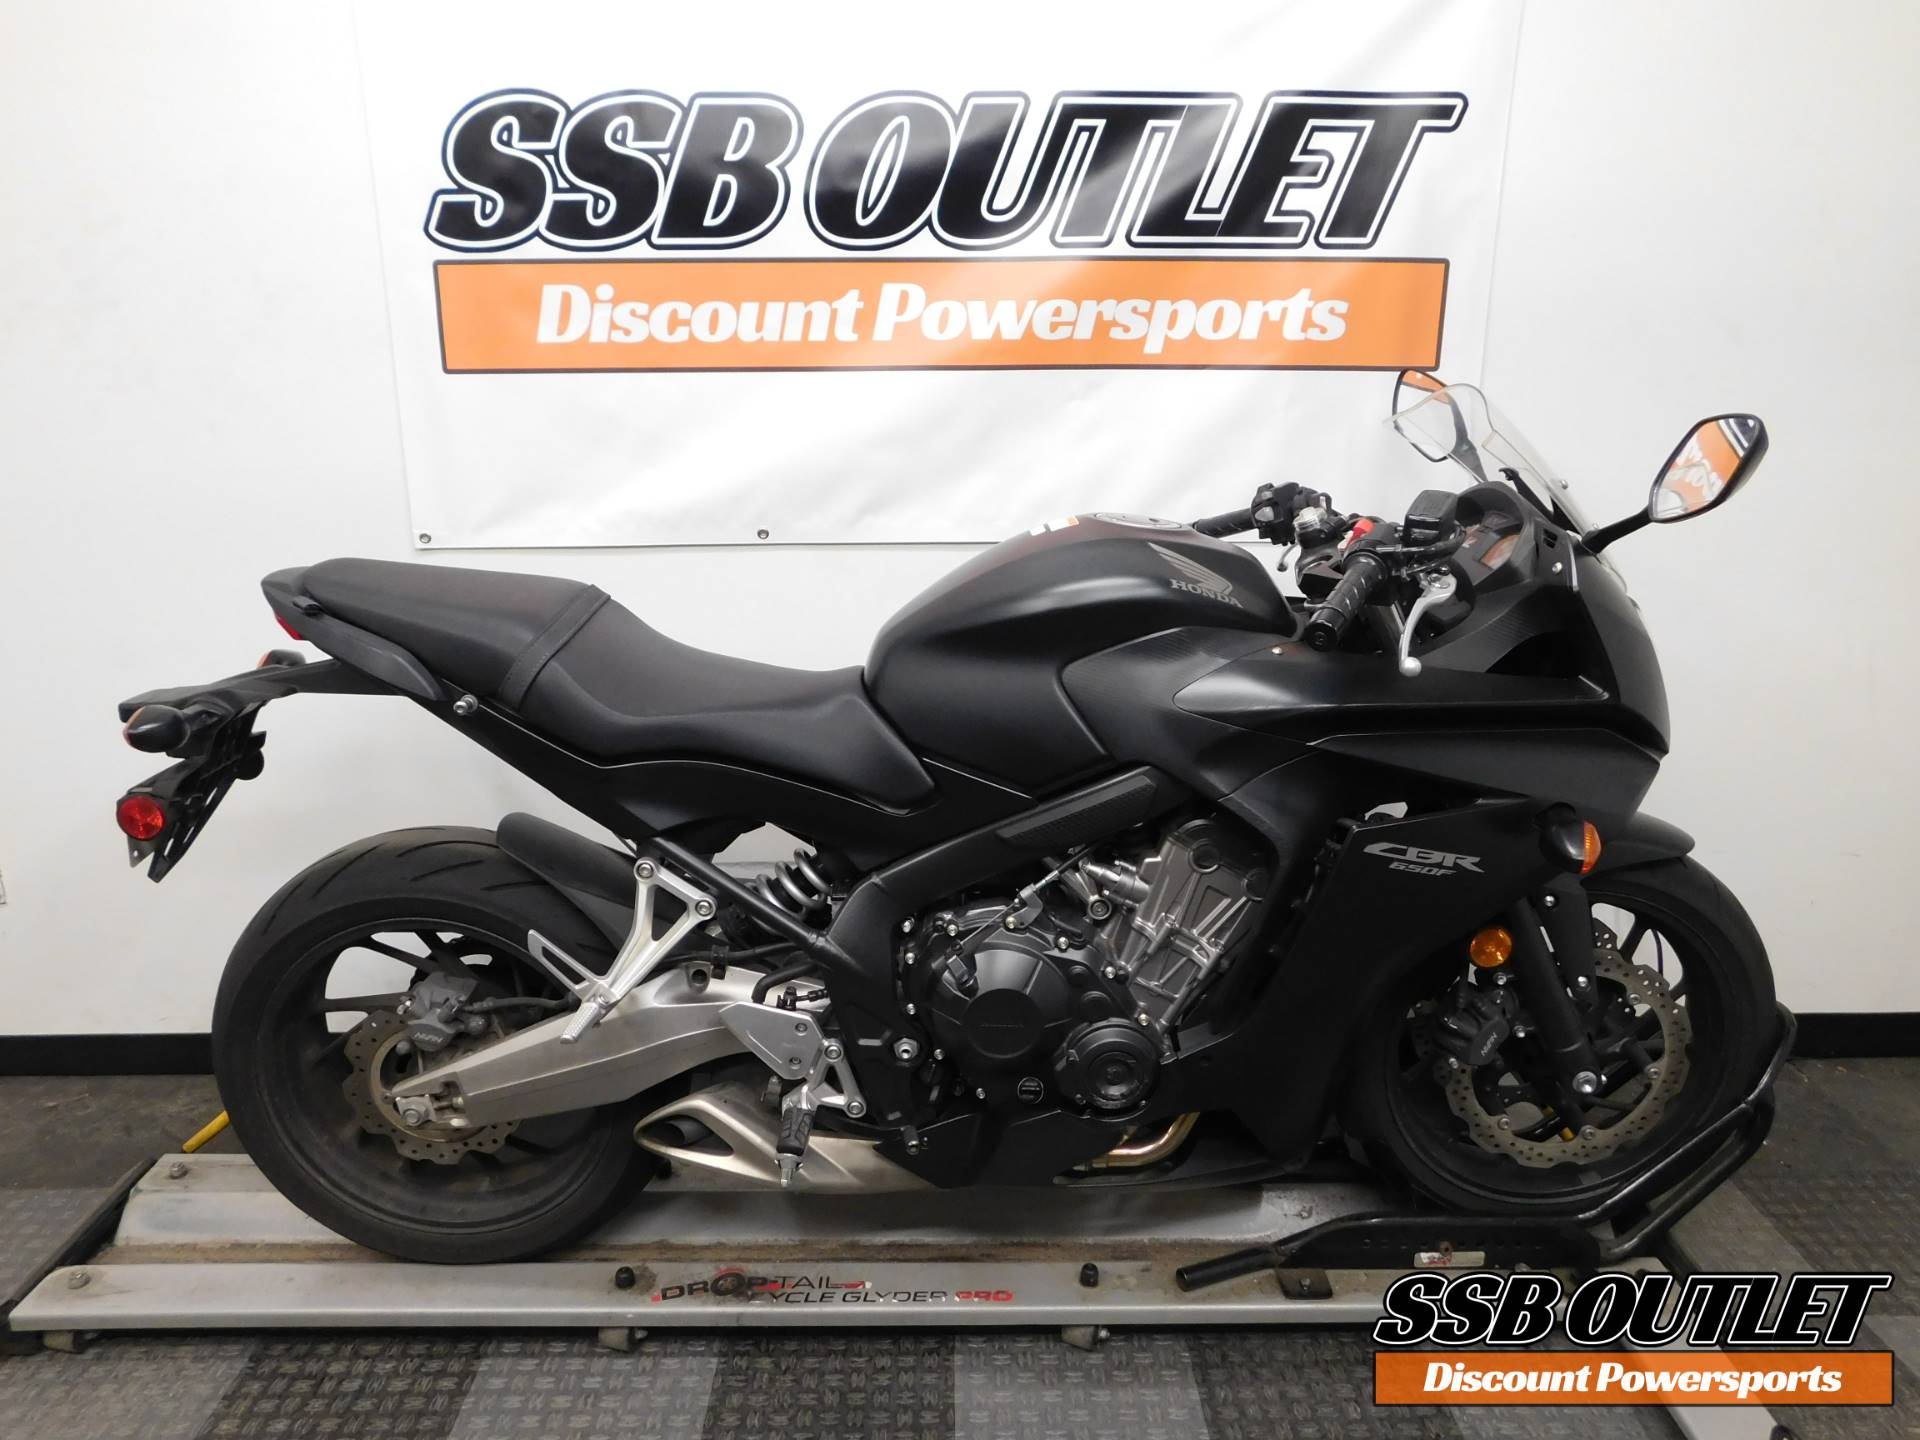 Used 2014 Honda CBR®650F Motorcycles in Eden Prairie, MN | Stock ...